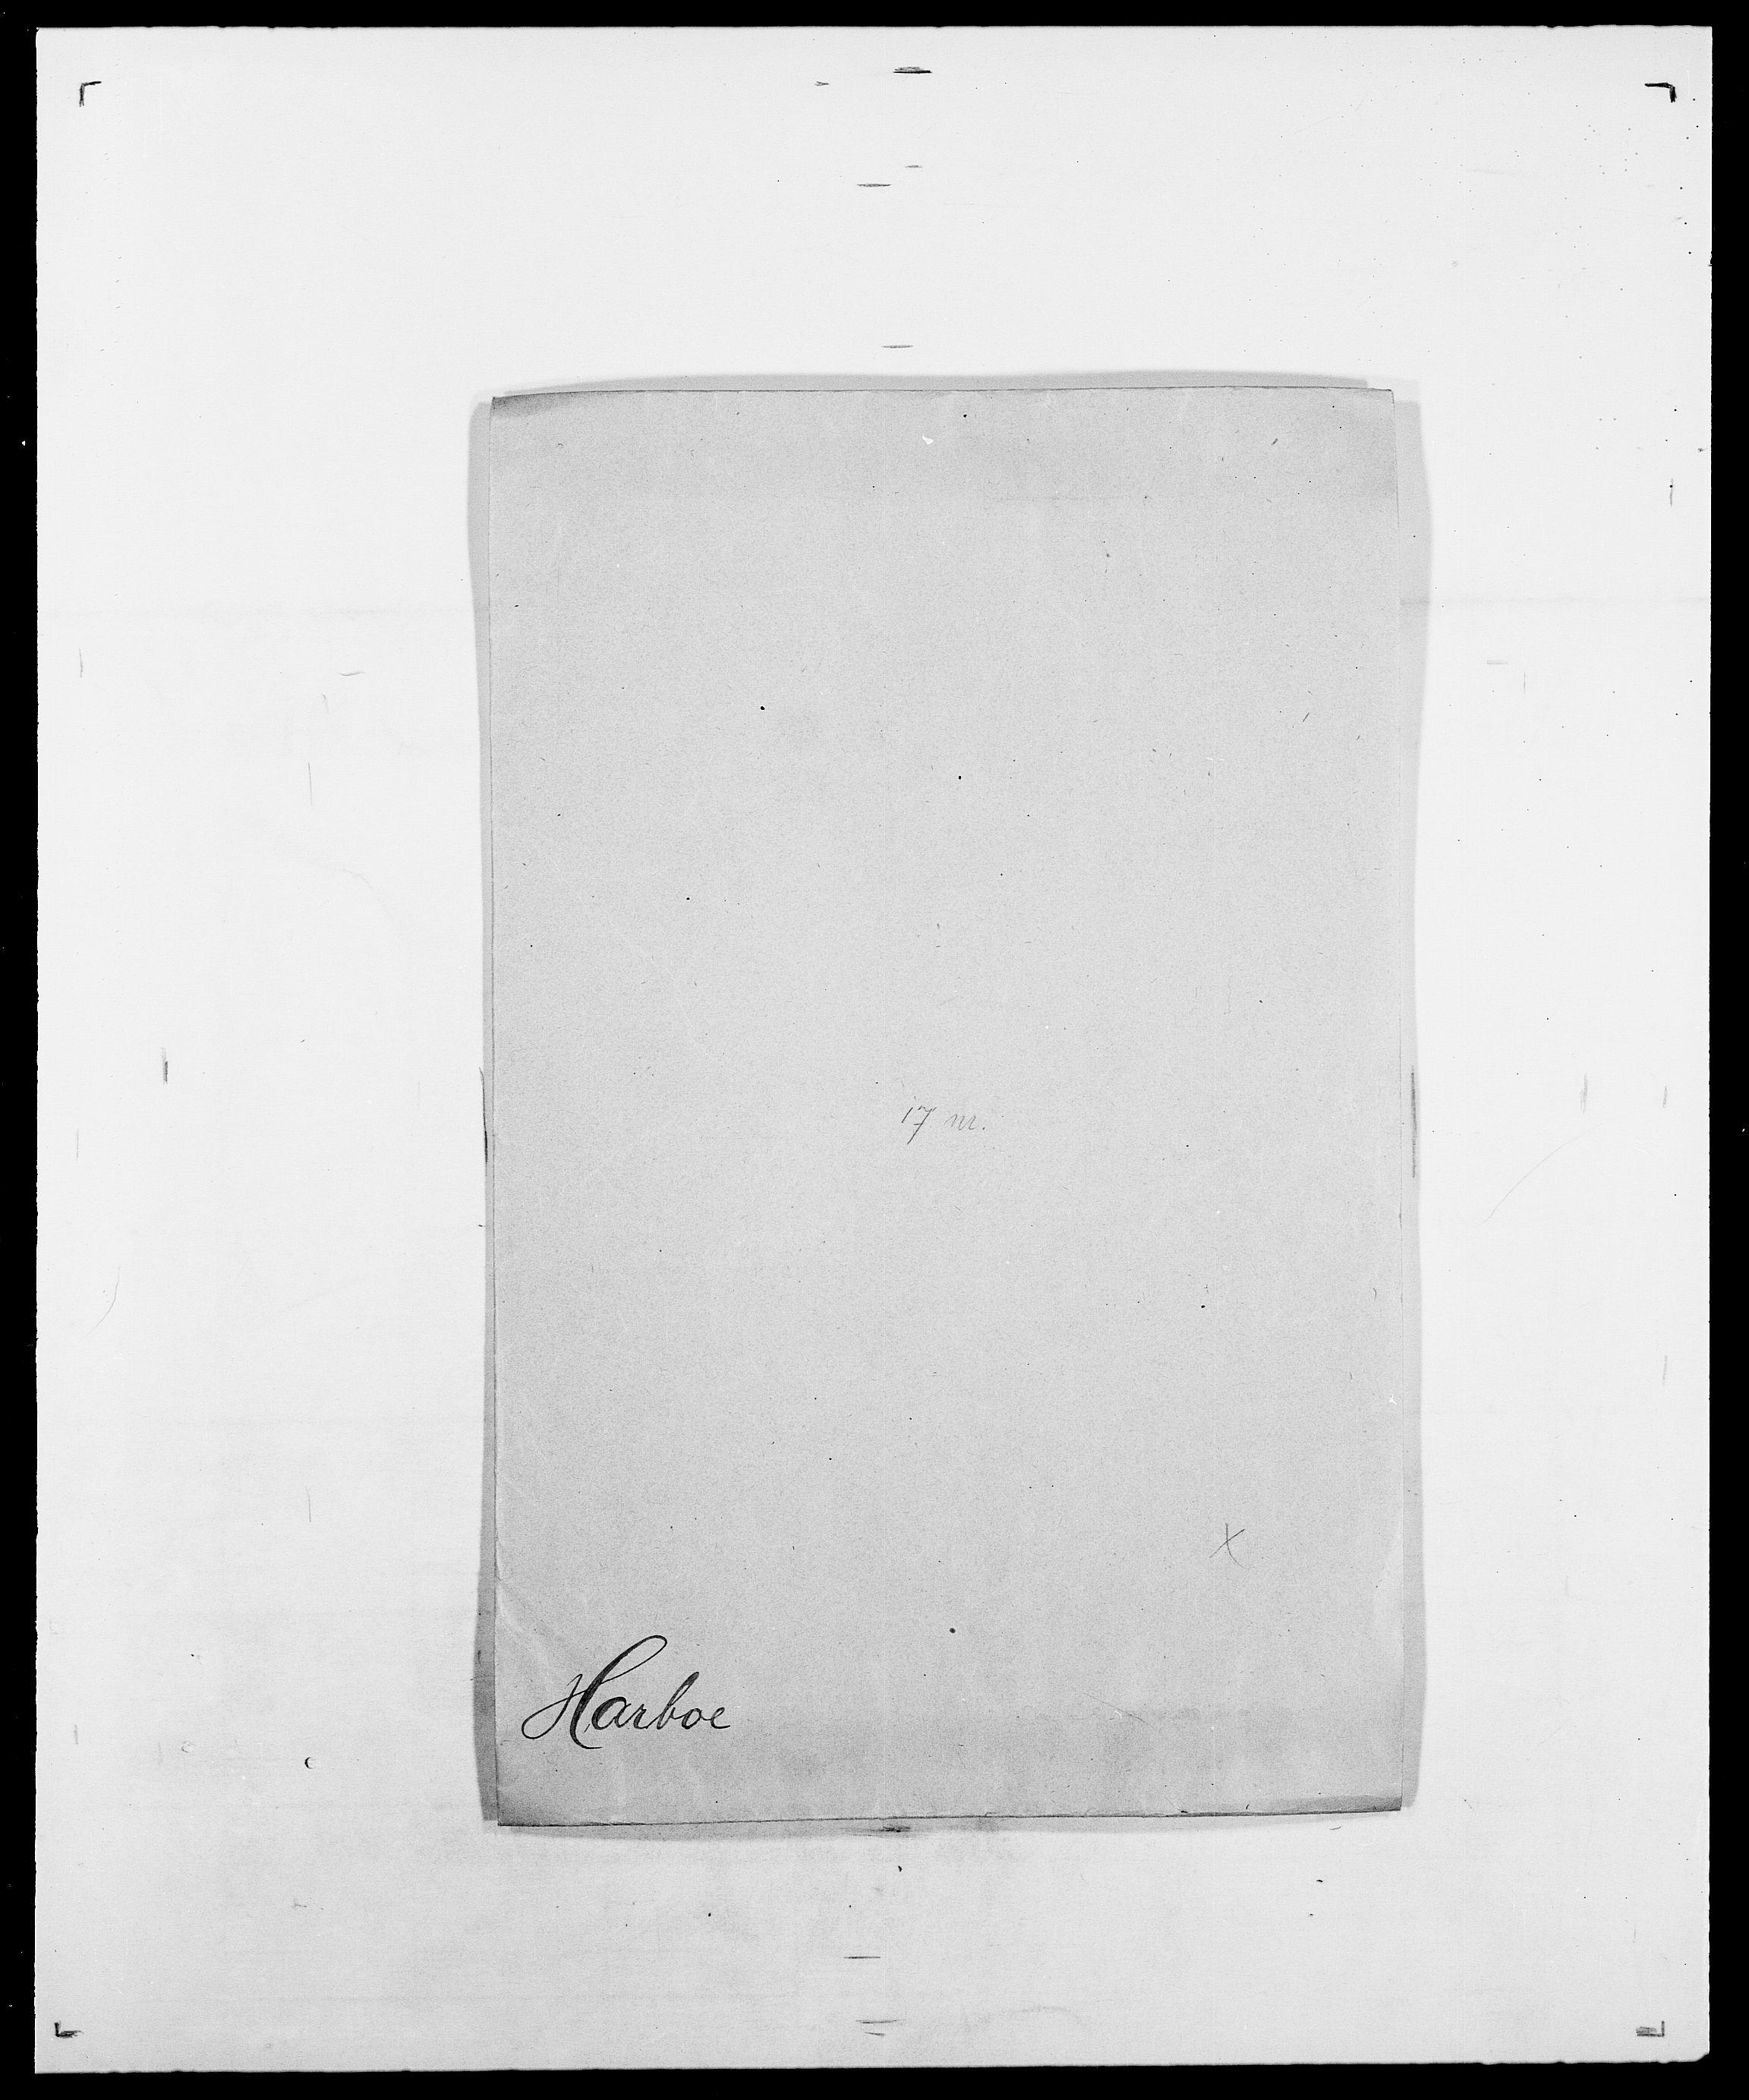 SAO, Delgobe, Charles Antoine - samling, D/Da/L0016: Hamborg - Hektoen, s. 377